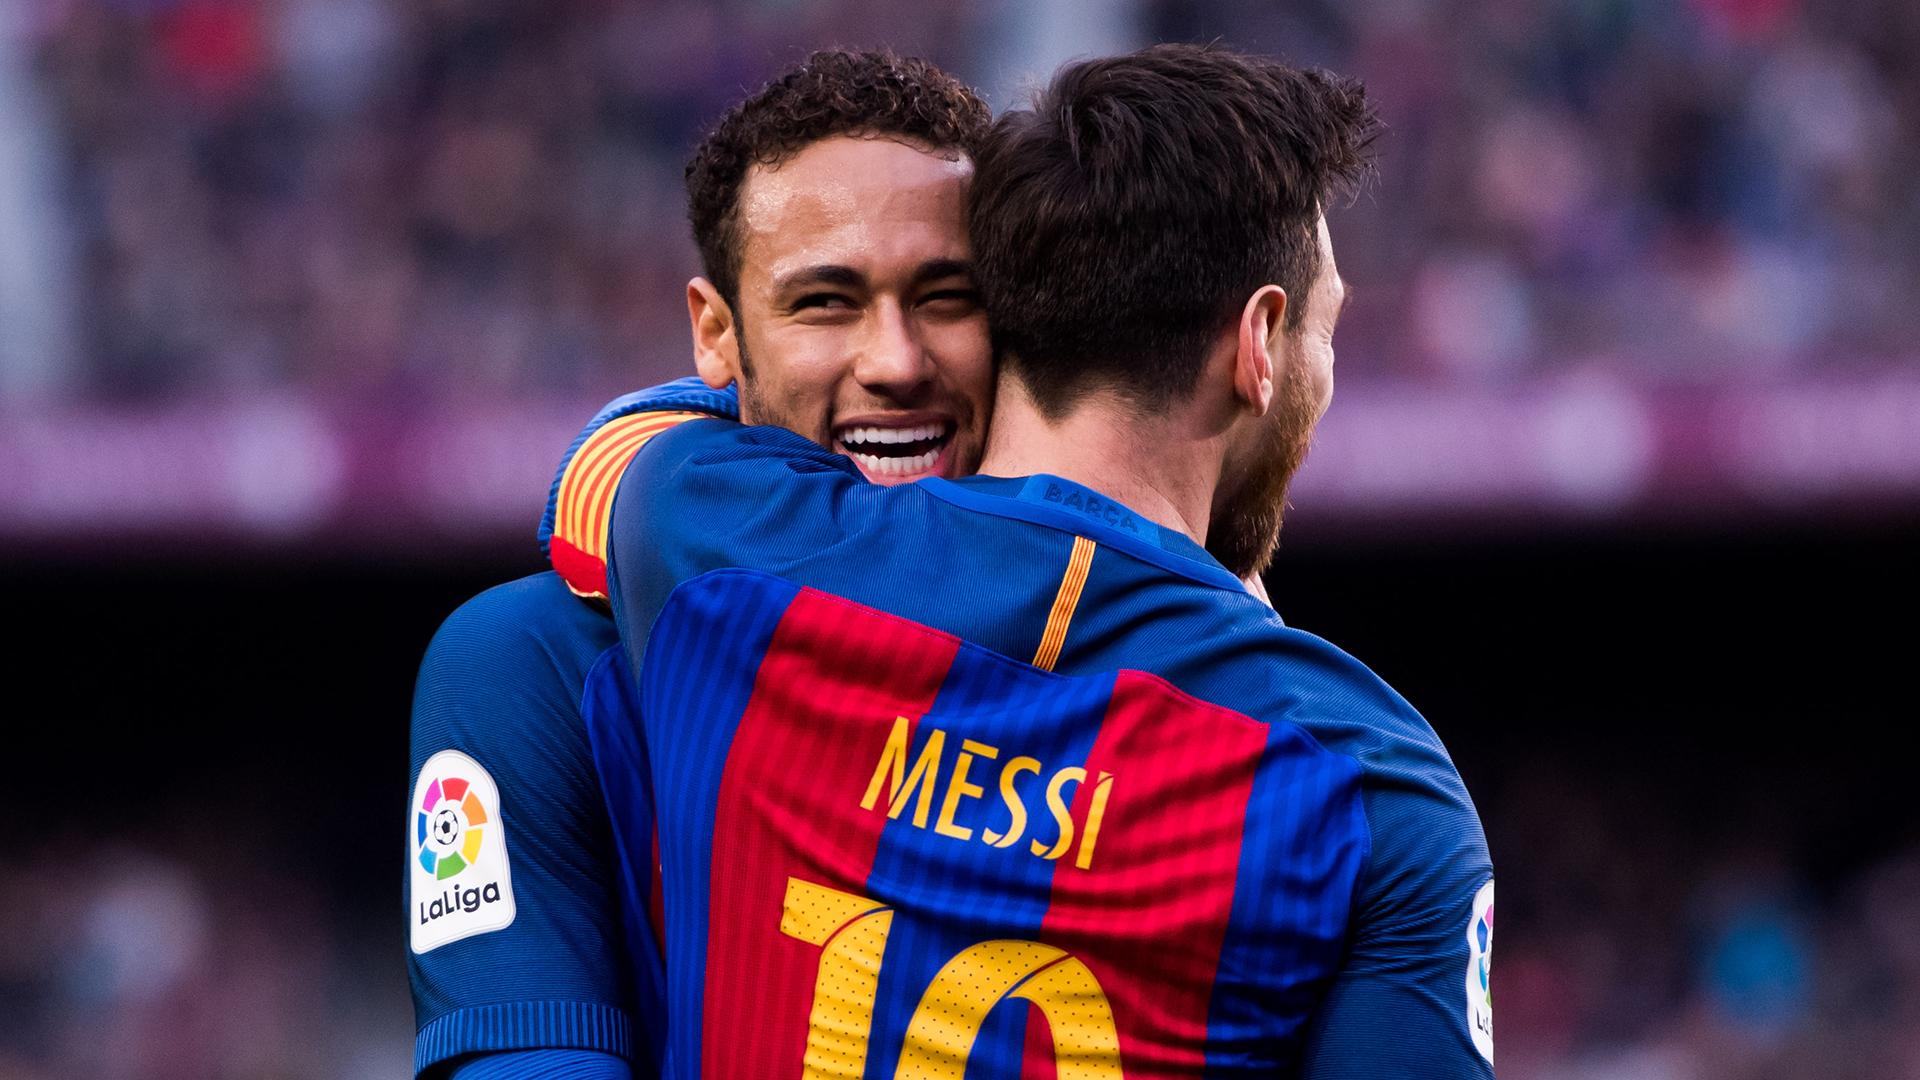 Video: Messi admits Neymar reunion influenced PSG move